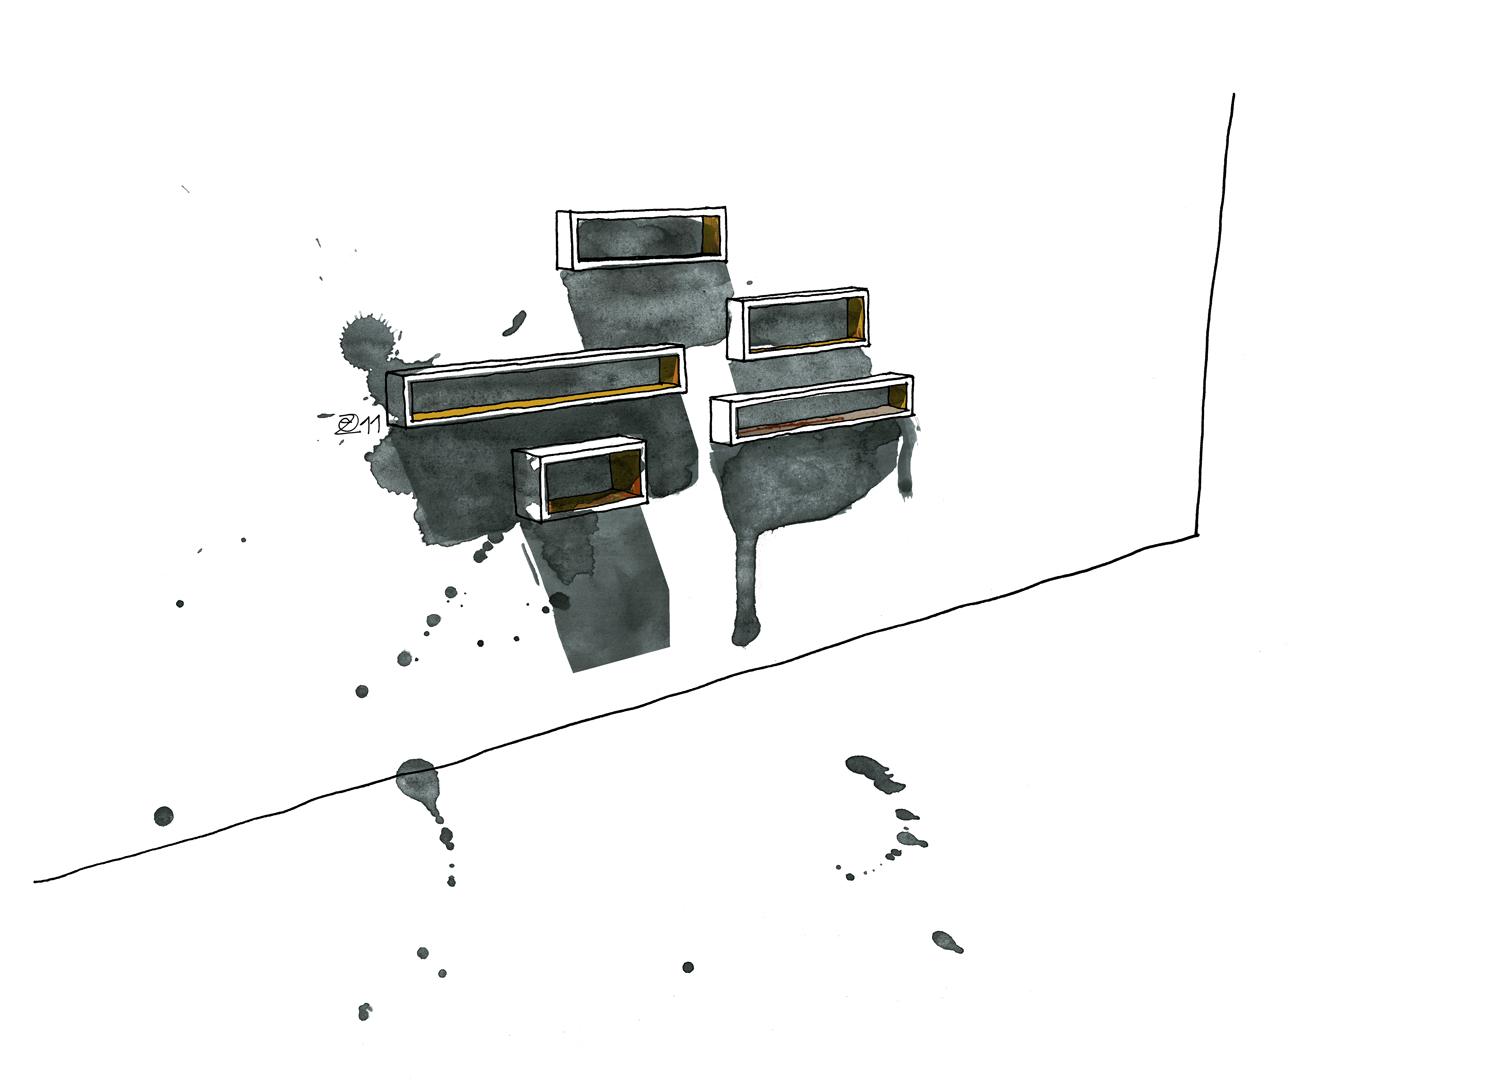 Designermöbel handgefertigt nach Maß in Berlin. KERTI Wall Mounted Shelves made from Berlin floorboards. Design and furniture design illustration by Studio KERTI. Architect and Designer Maker in Berlin.